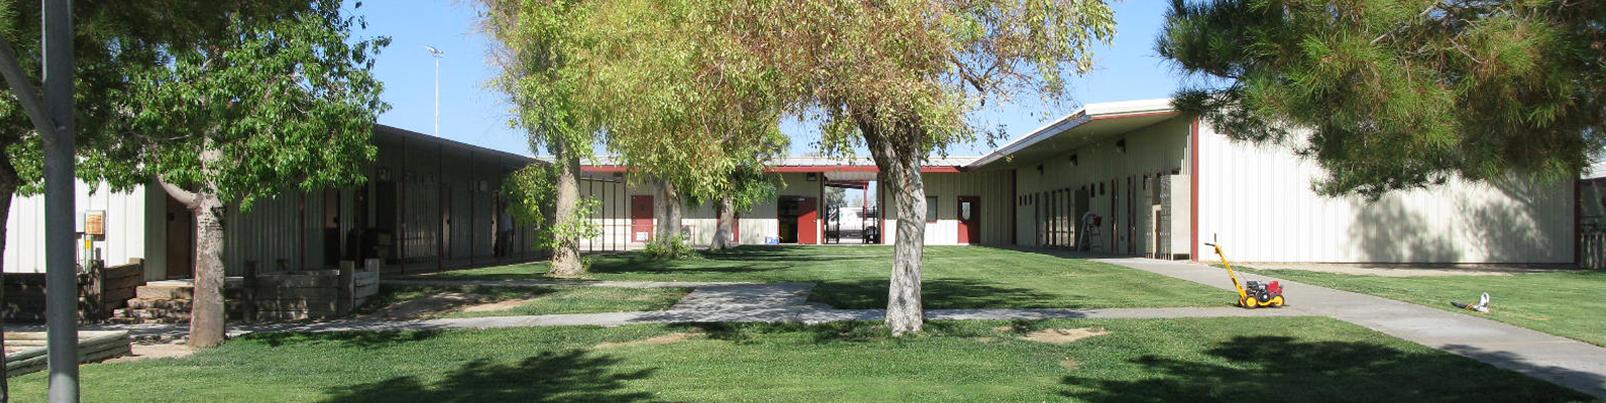 3-Salome Elementary